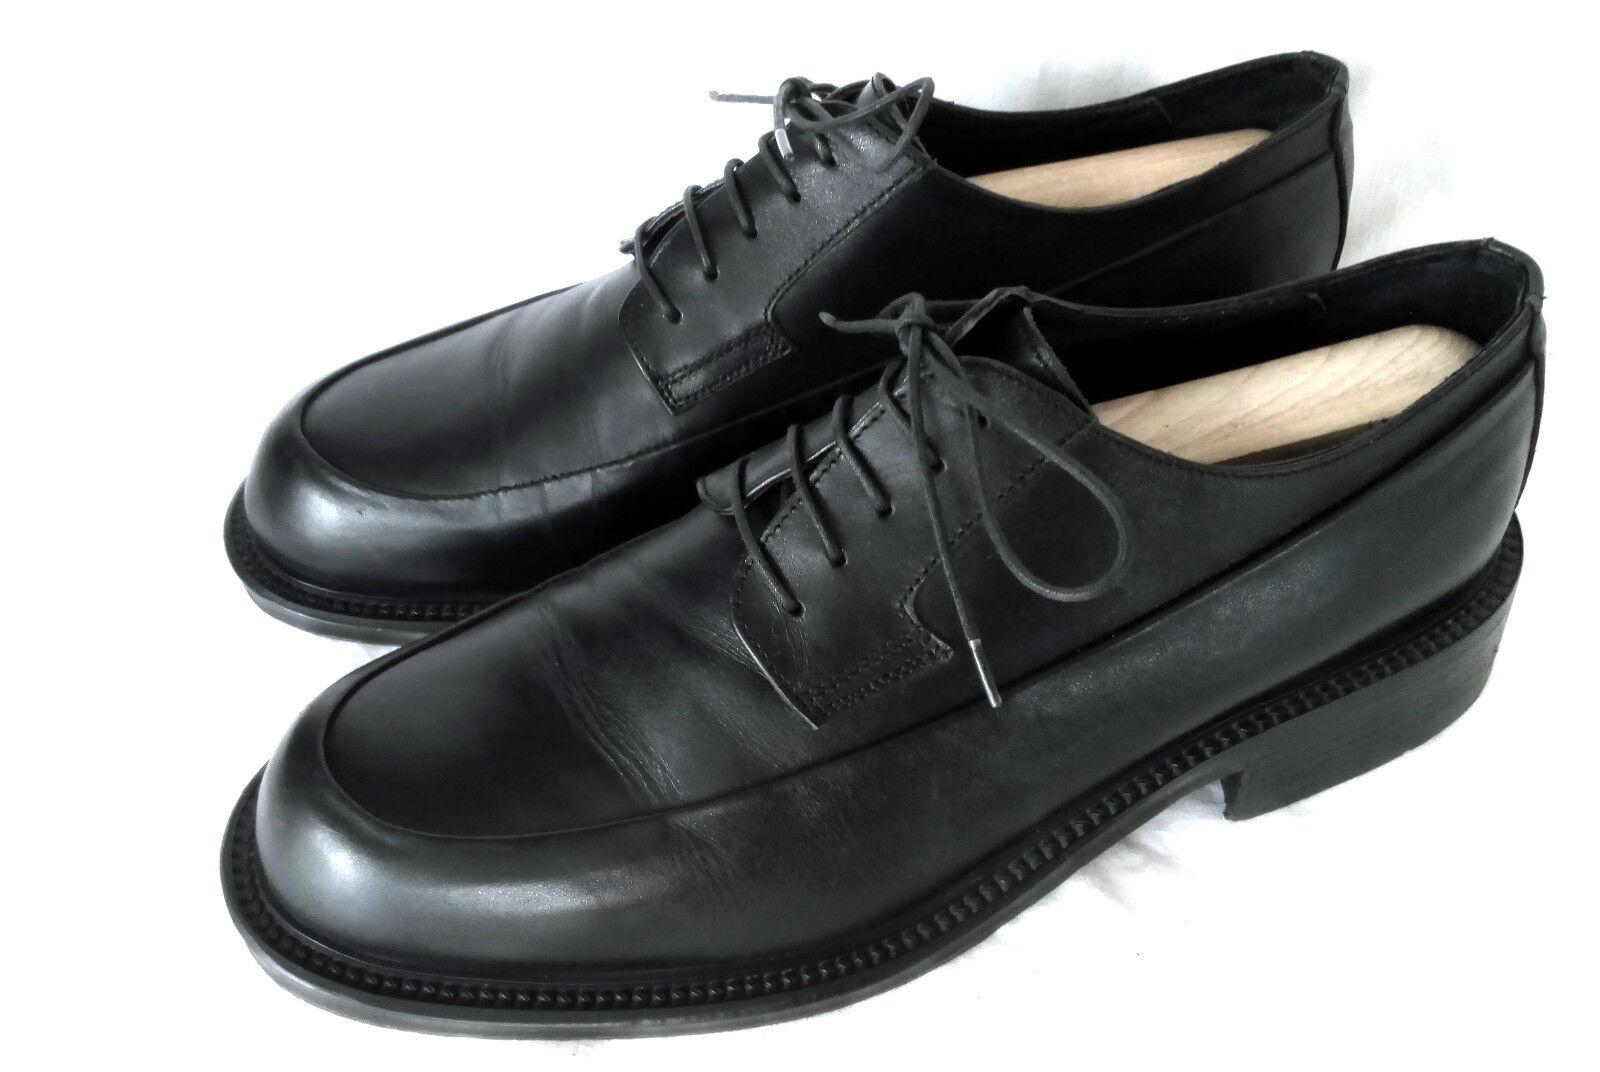 Alberto Monti Apron Toe Derby Affaires Chaussures Hommes Noir Cuir Taille 44